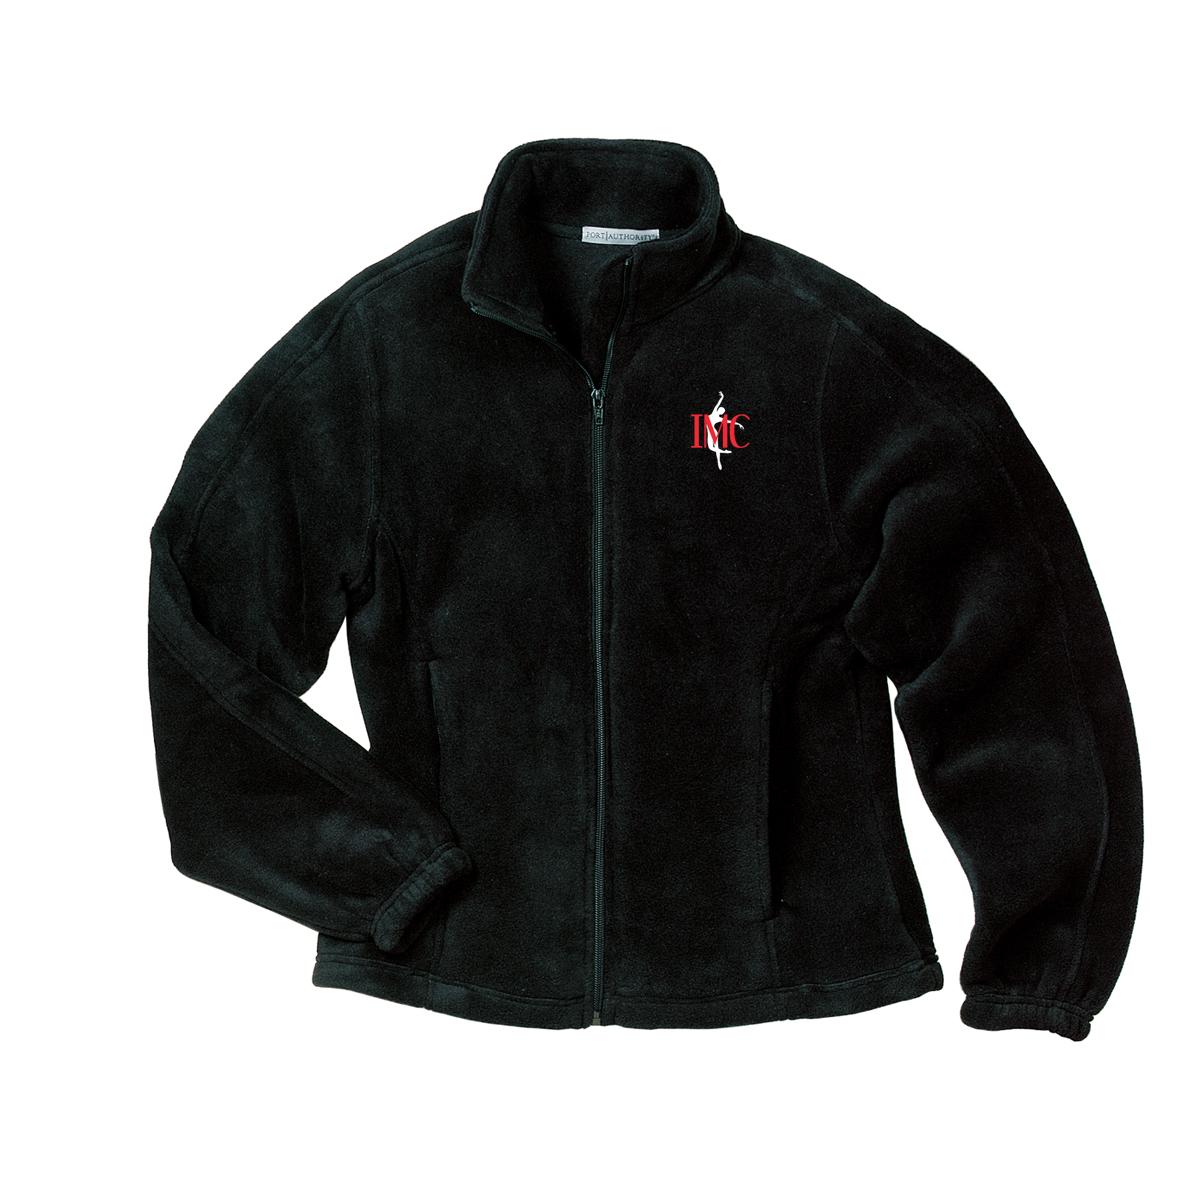 Island Moving Company - Youth Fleece Jacket